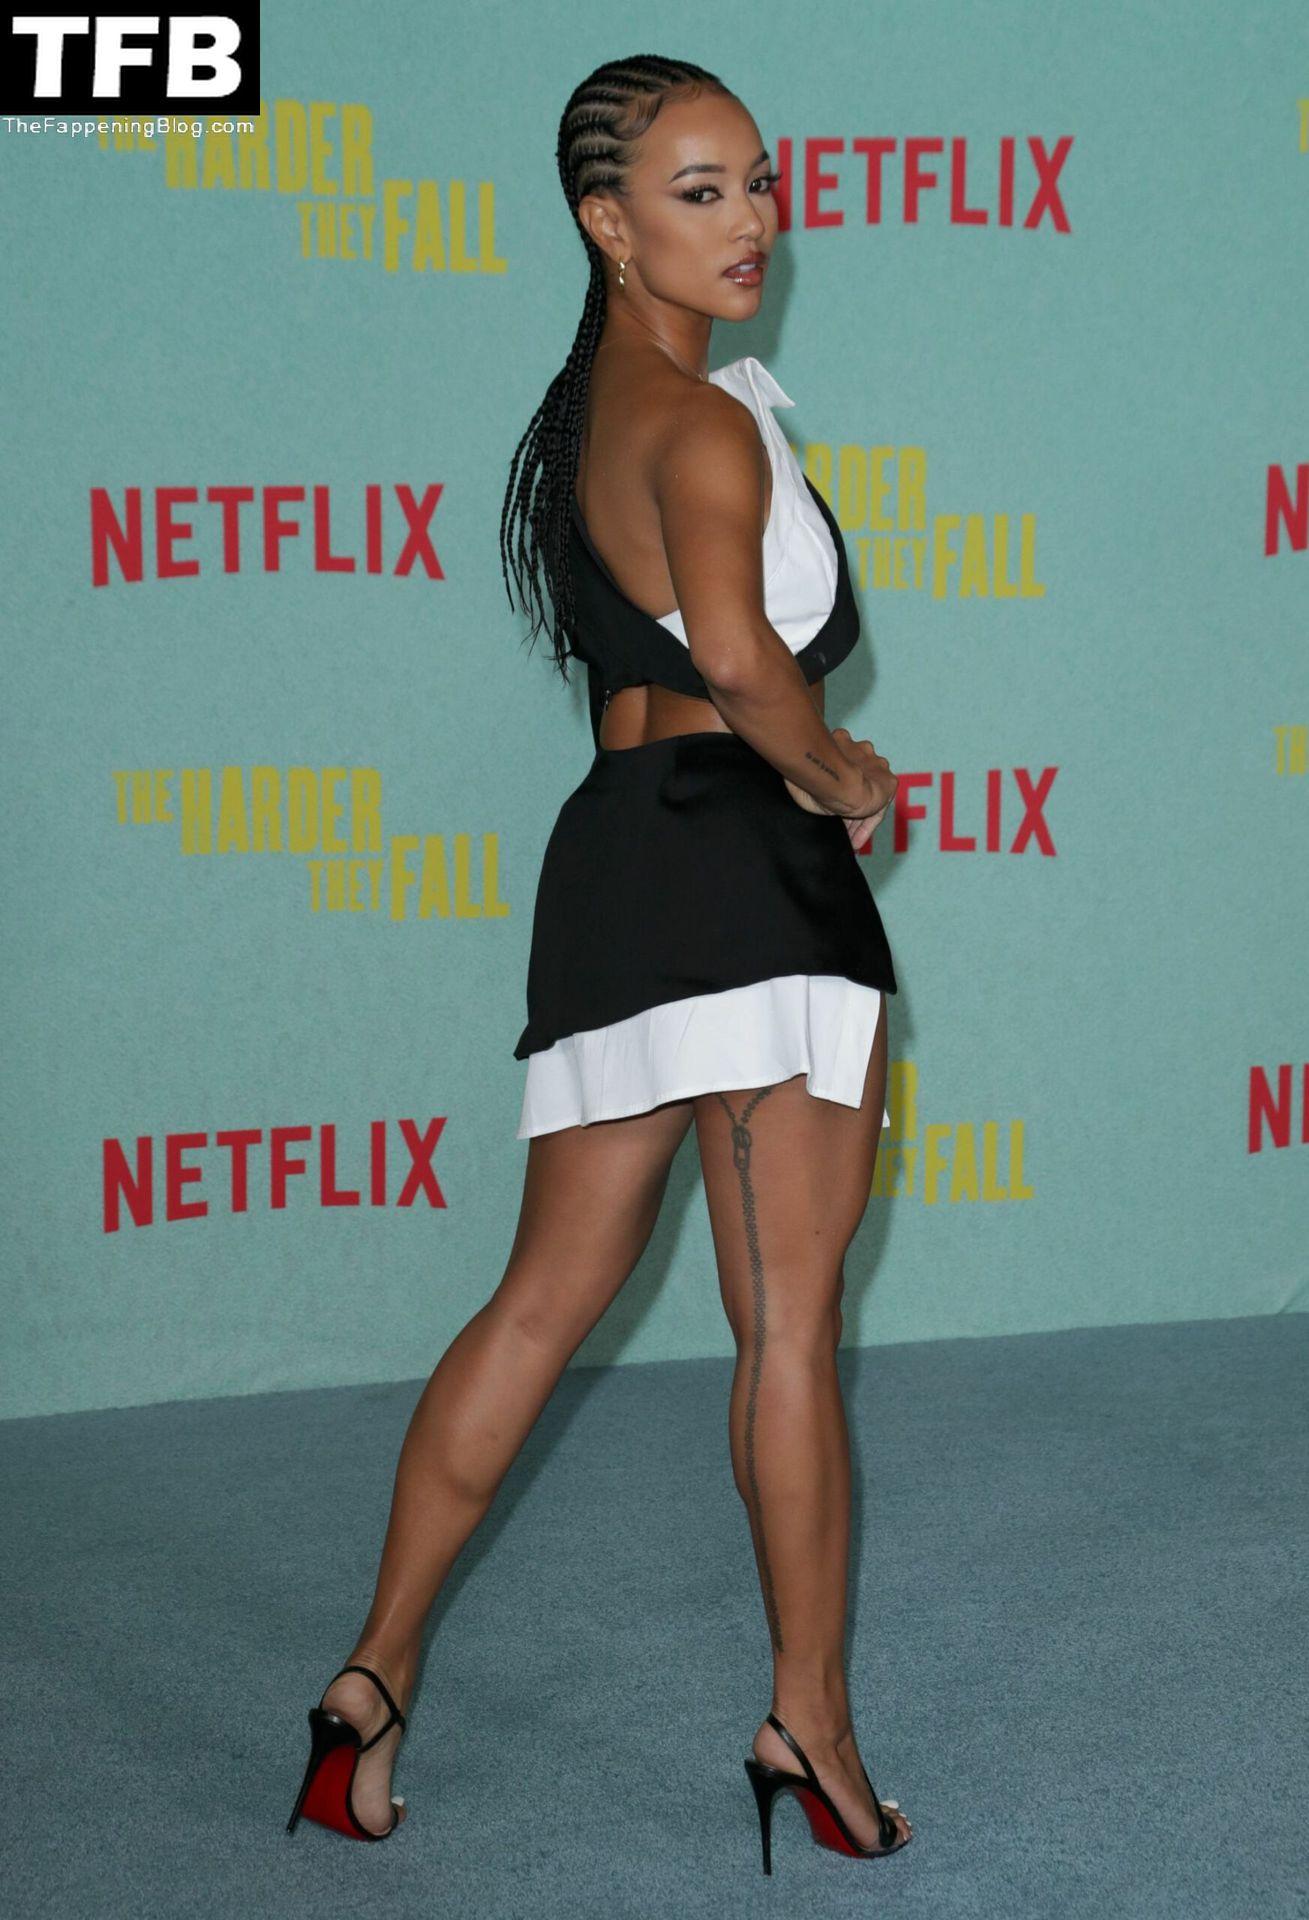 Karrueche-Tran-Sexy-Legs-Upskirt-The-Fappening-Blog-10.jpg